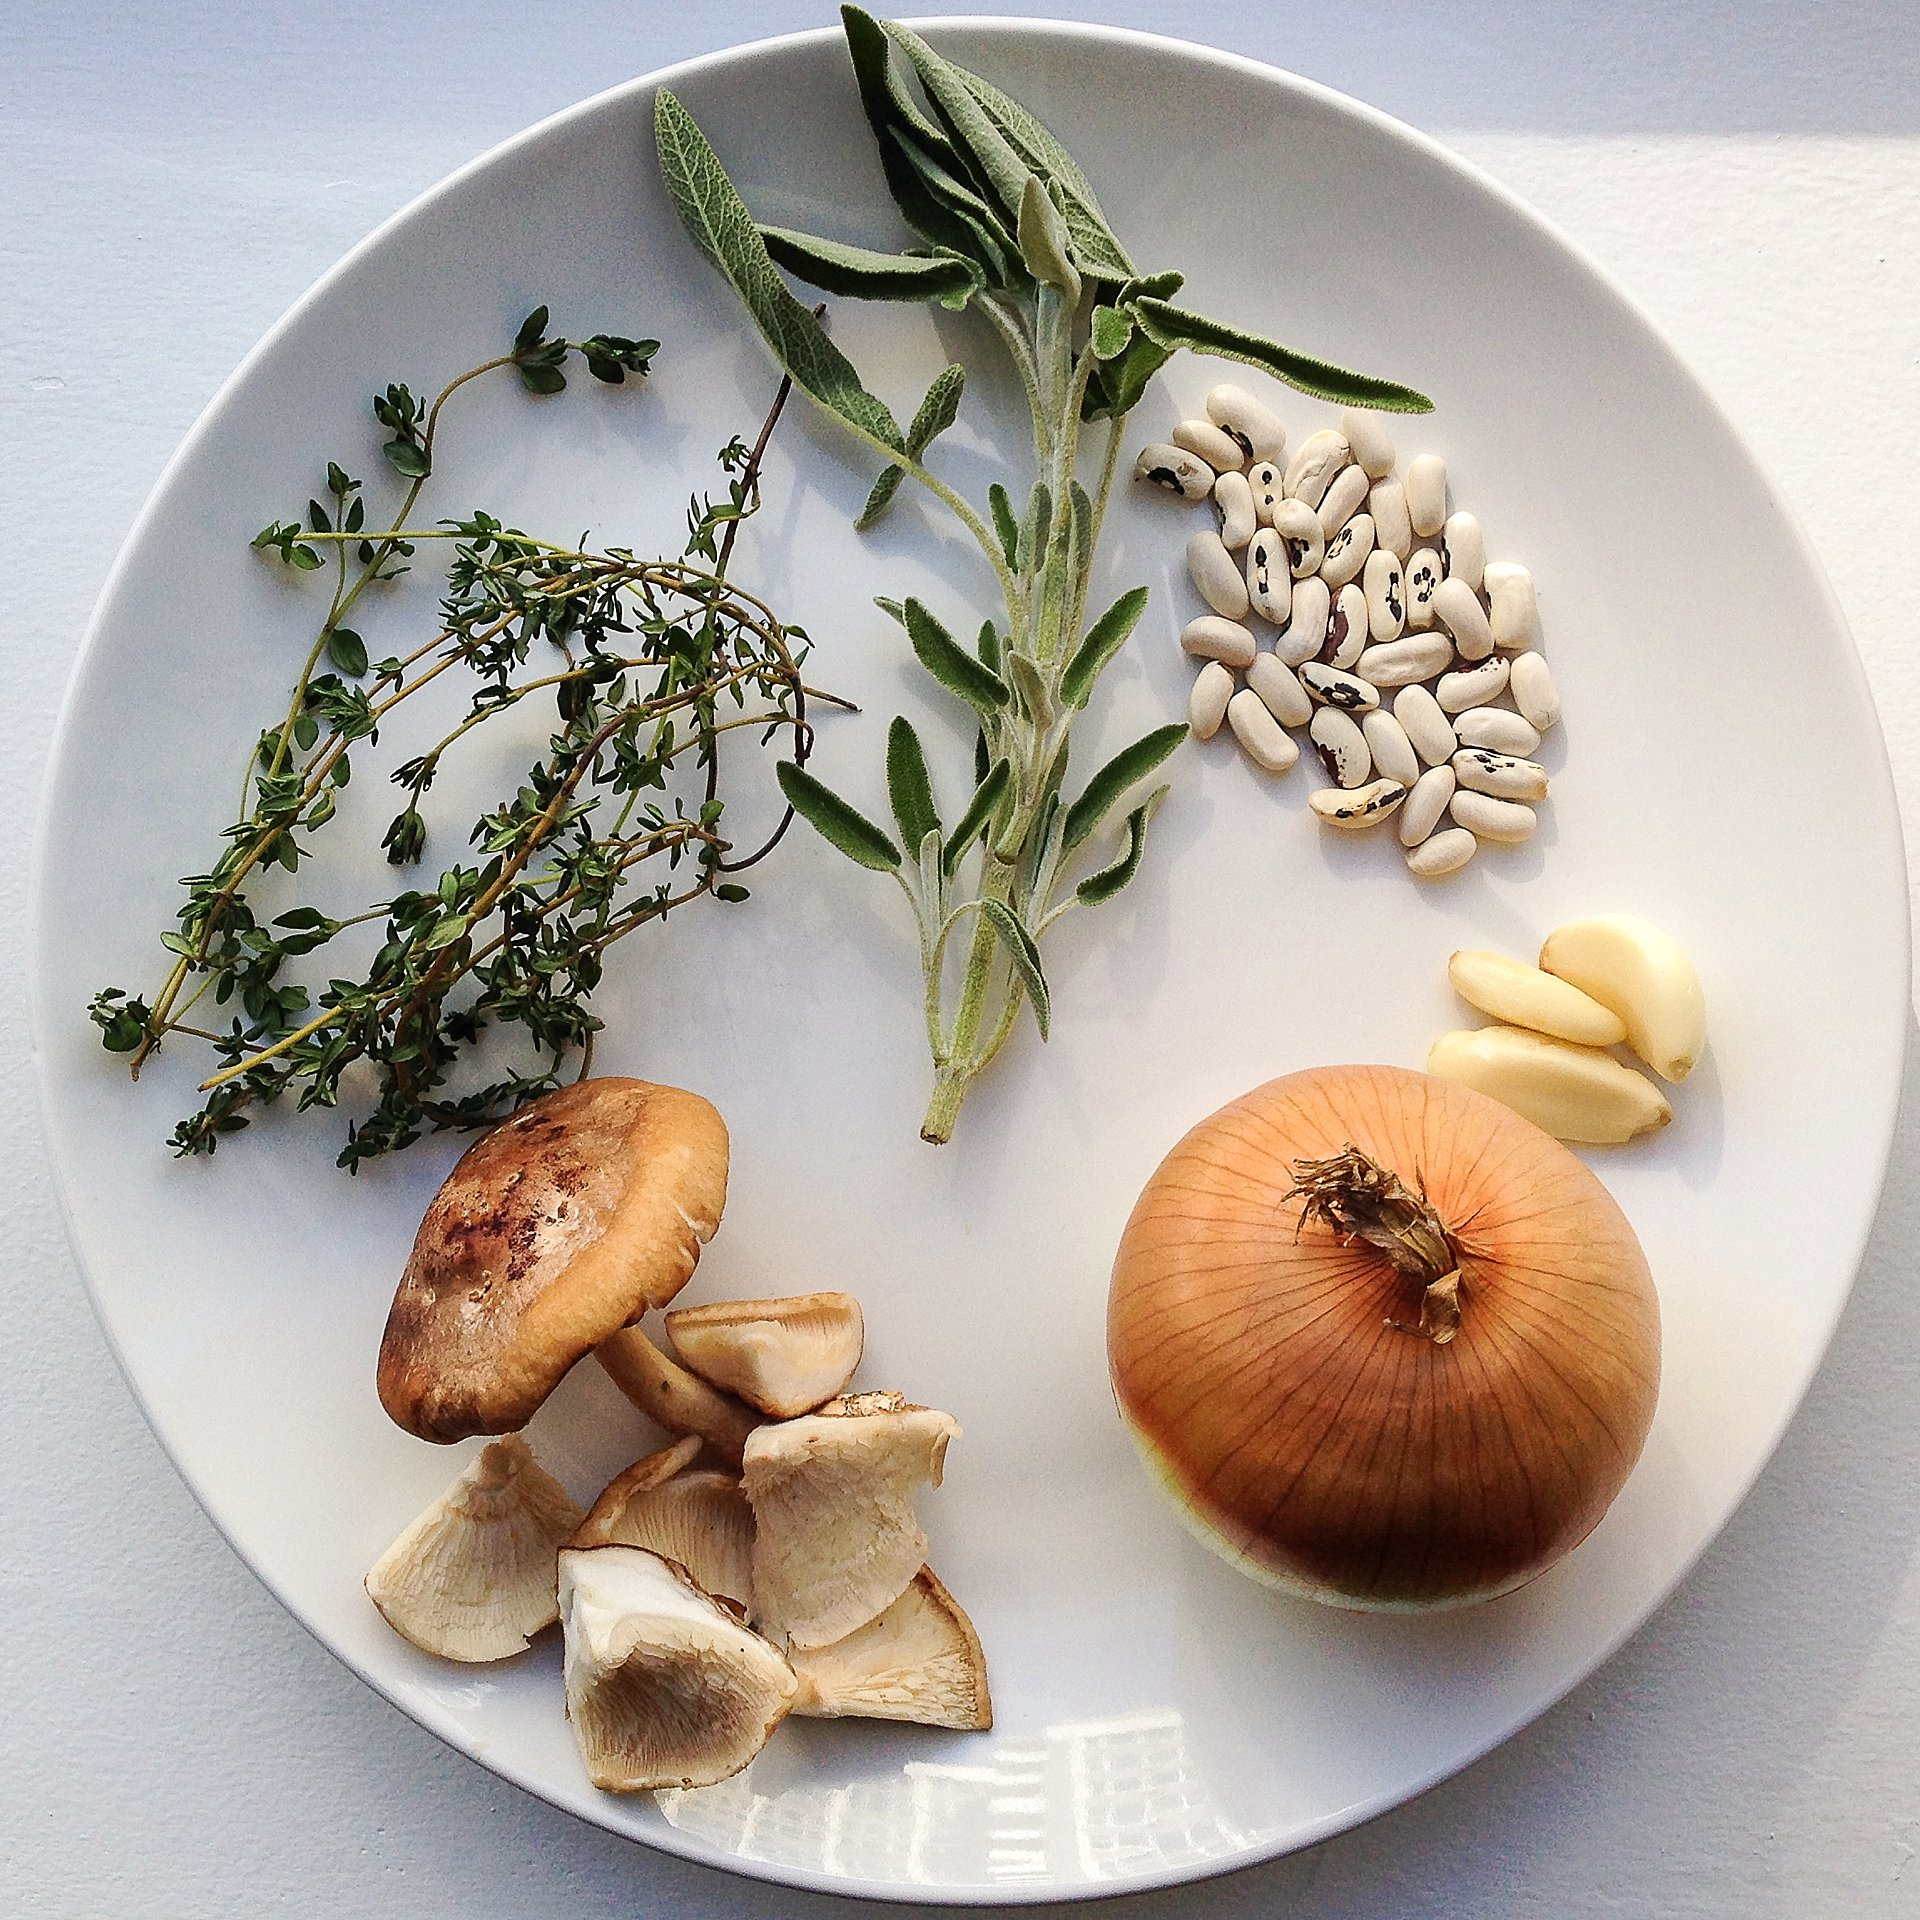 white bean soup recipe with shitake mushrooms